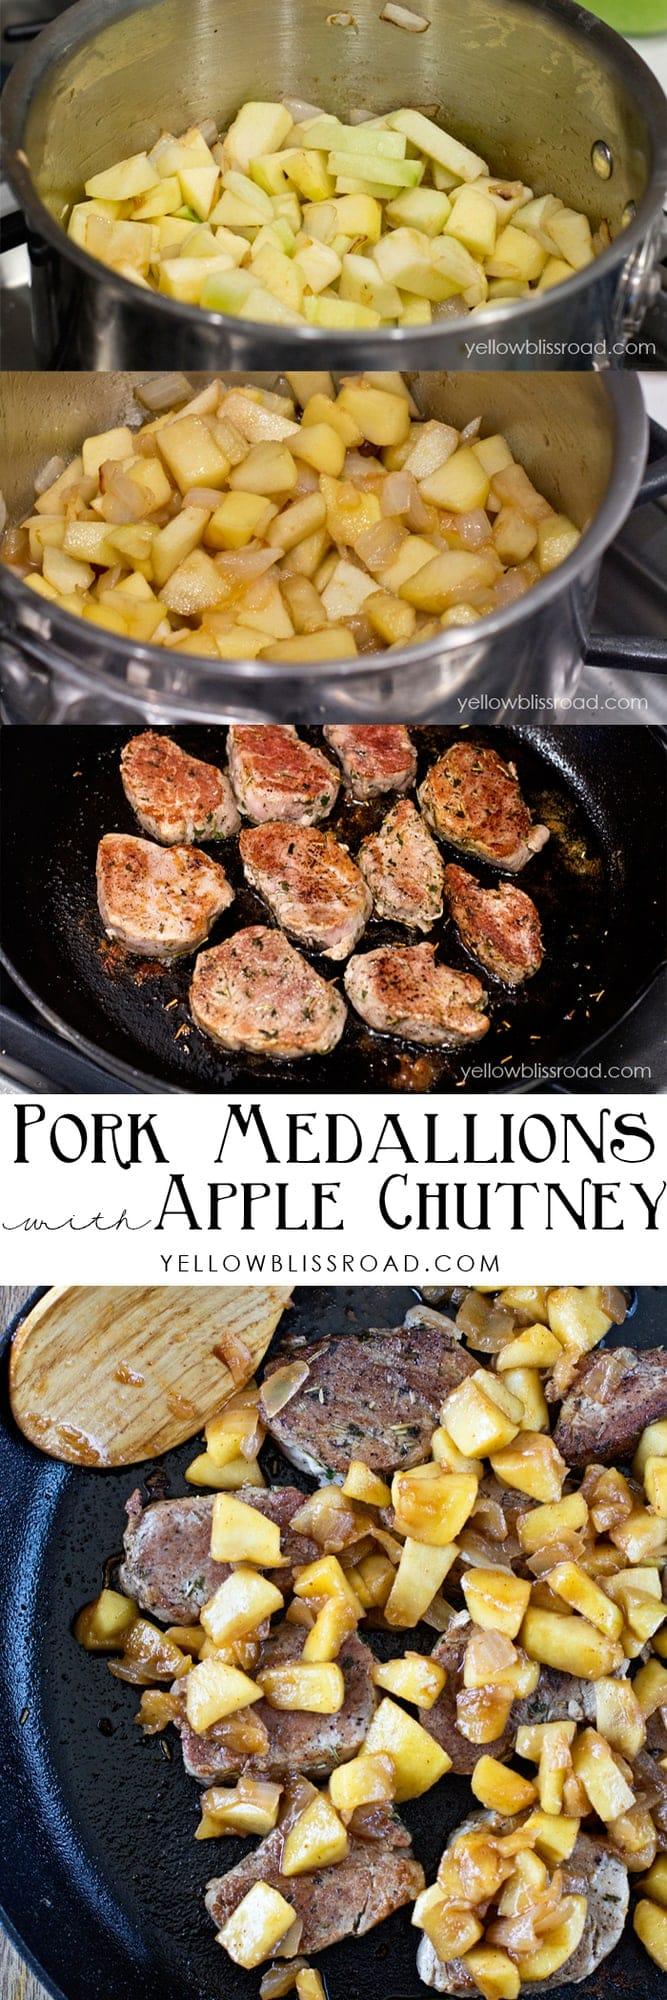 Pork Medallions with Savory Apple Chutney